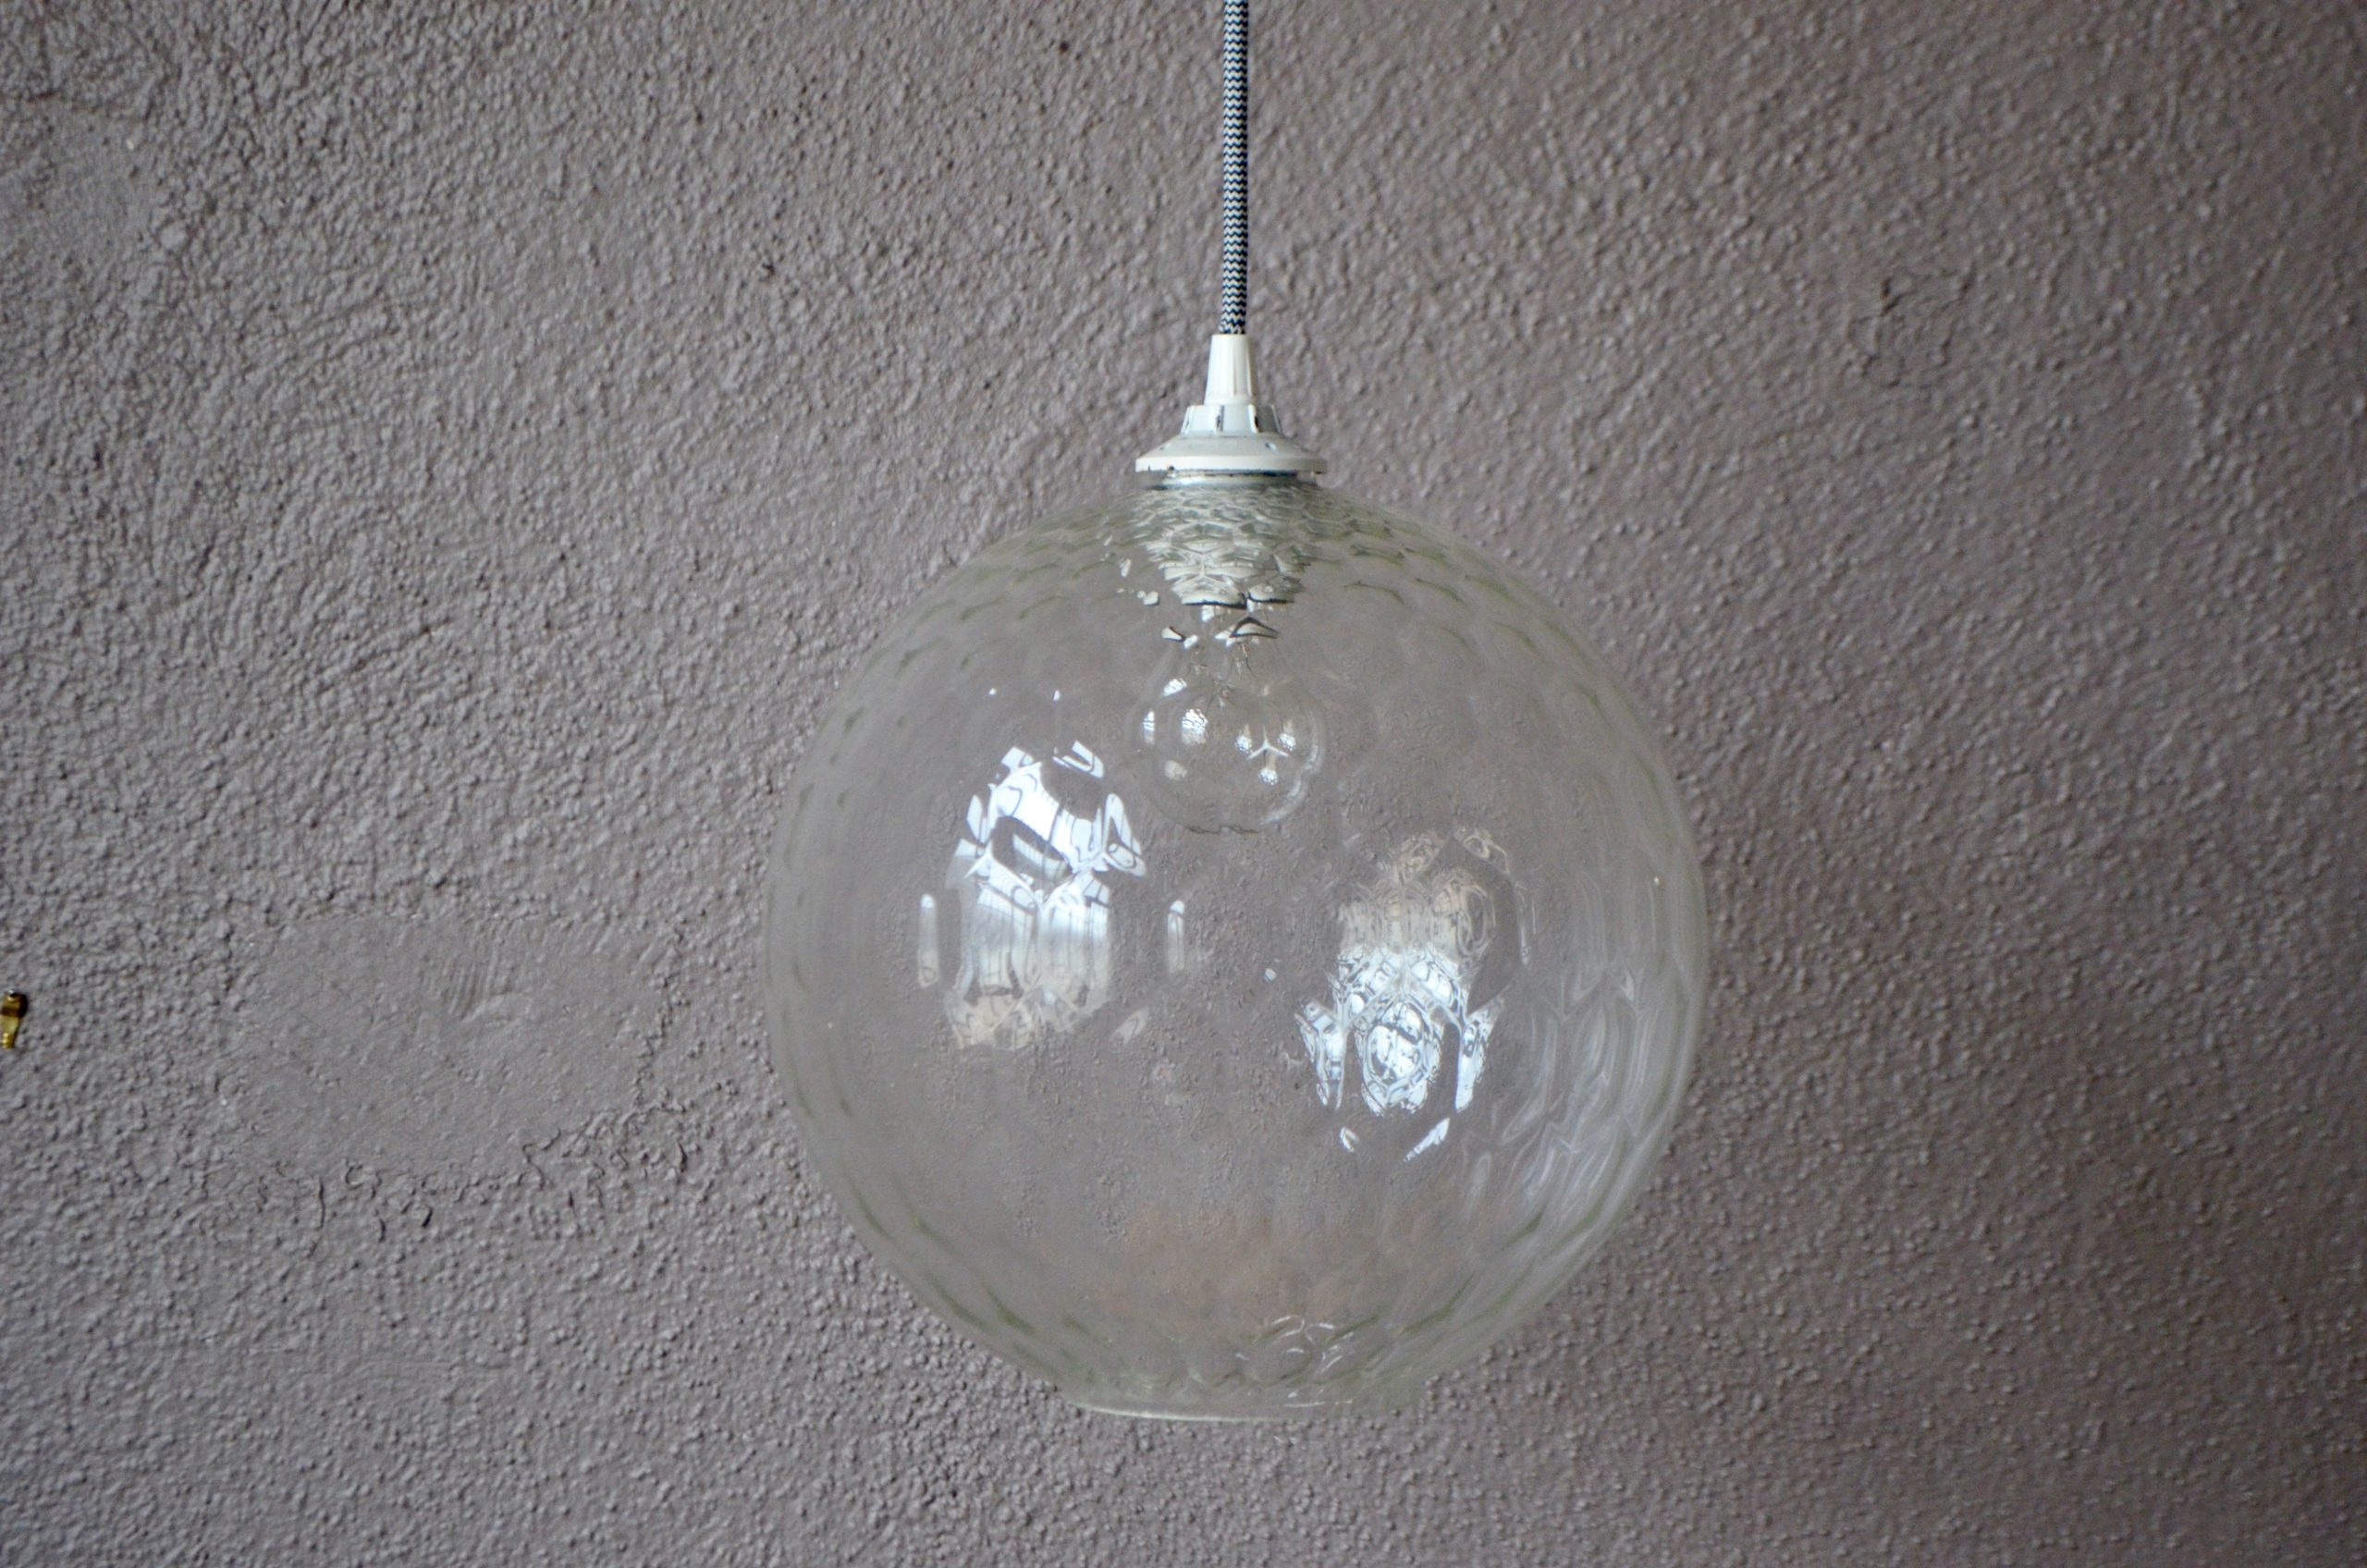 Lampe Suspension Plafonnier midcentury boule en verre design minimaliste